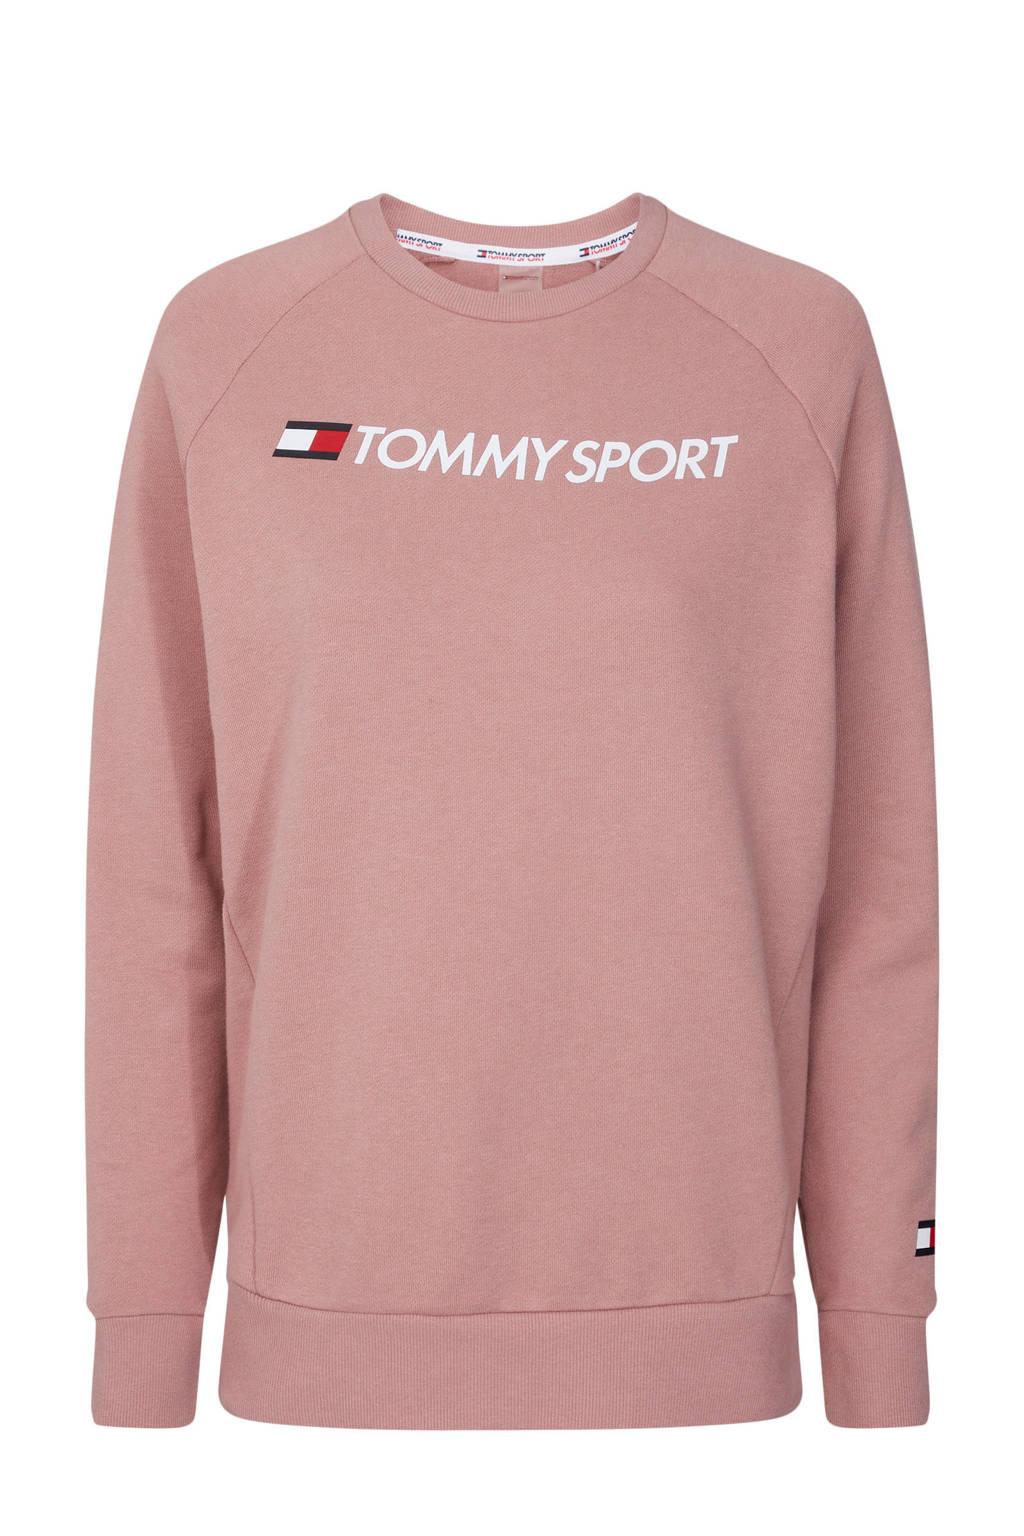 Tommy Hilfiger Sport sportsweater oudroze, Oudroze